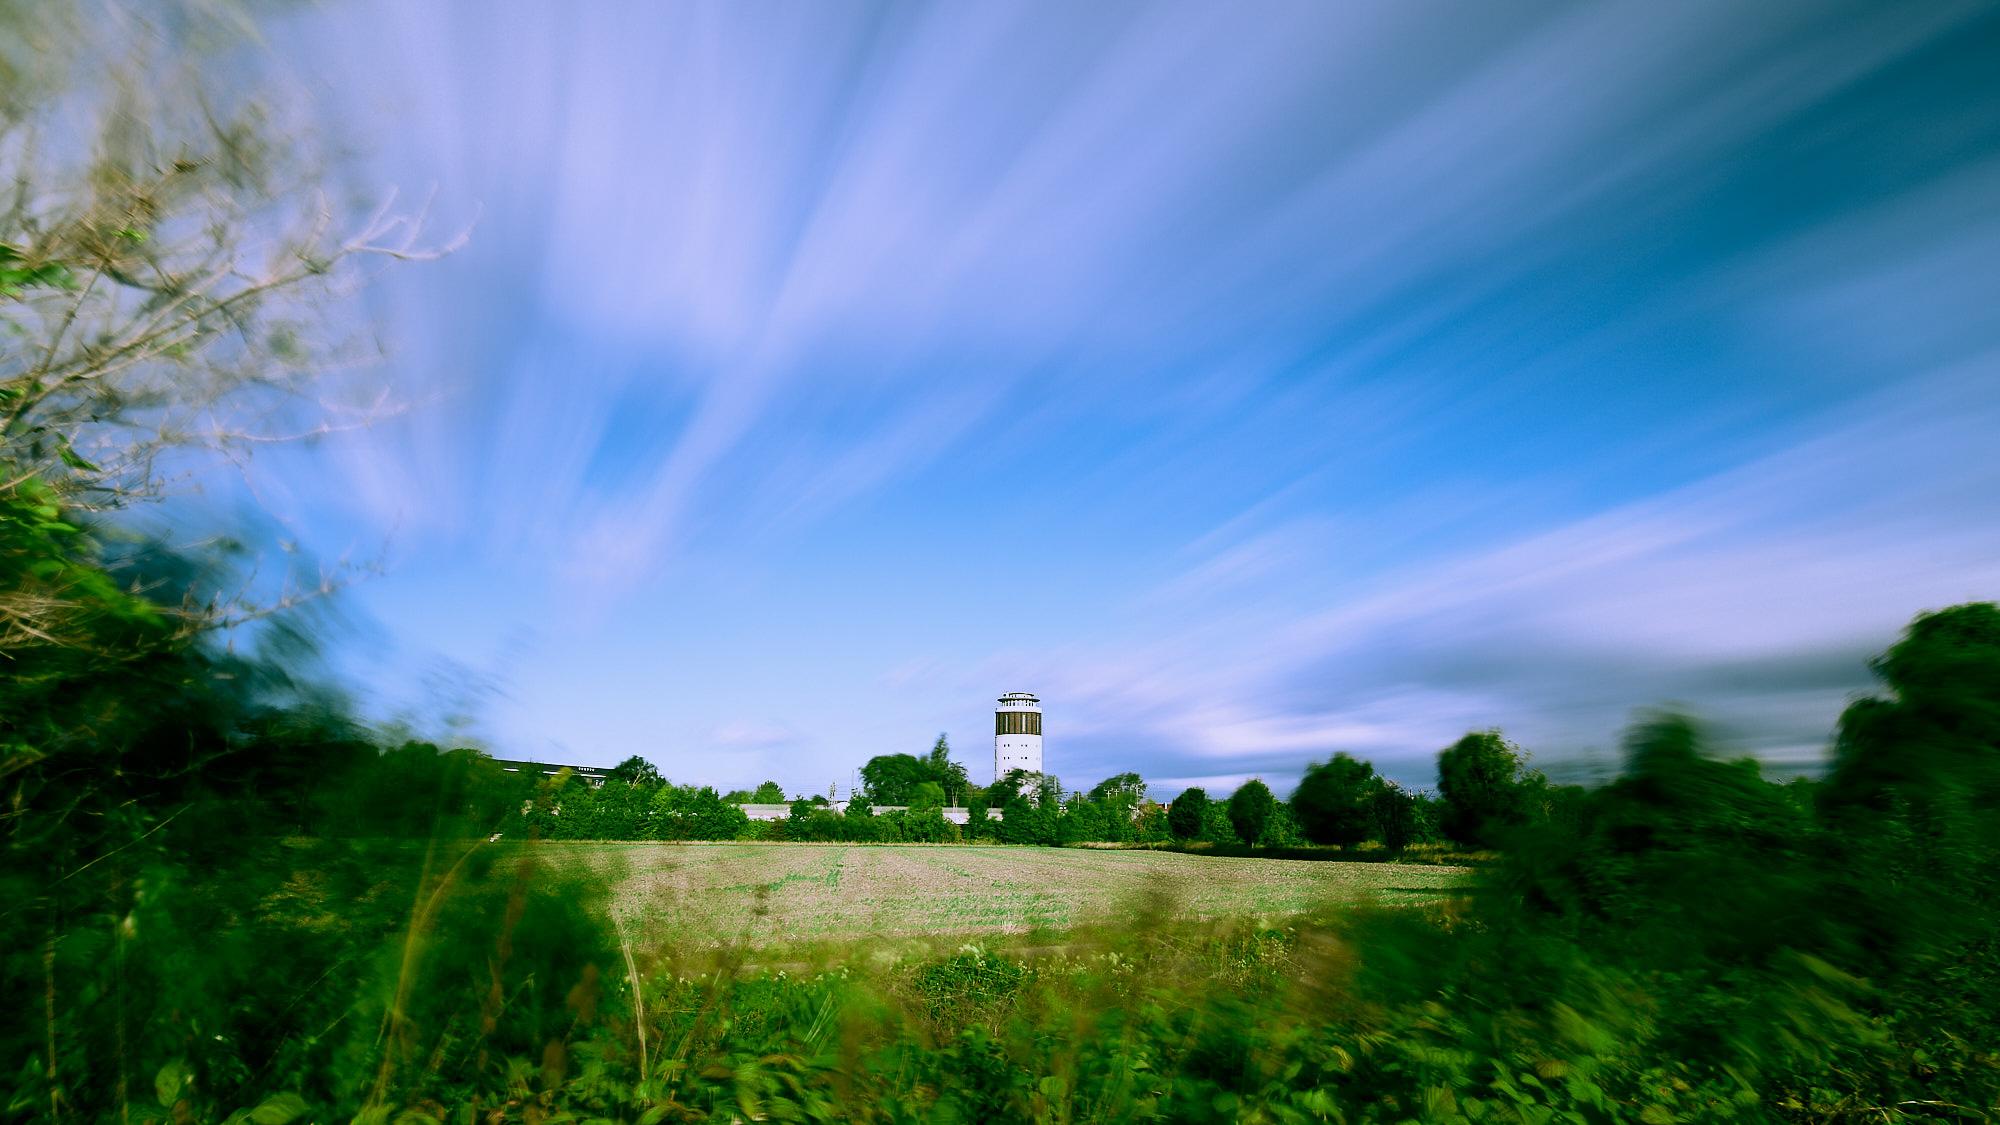 Wasserturm in Gross-Gerau